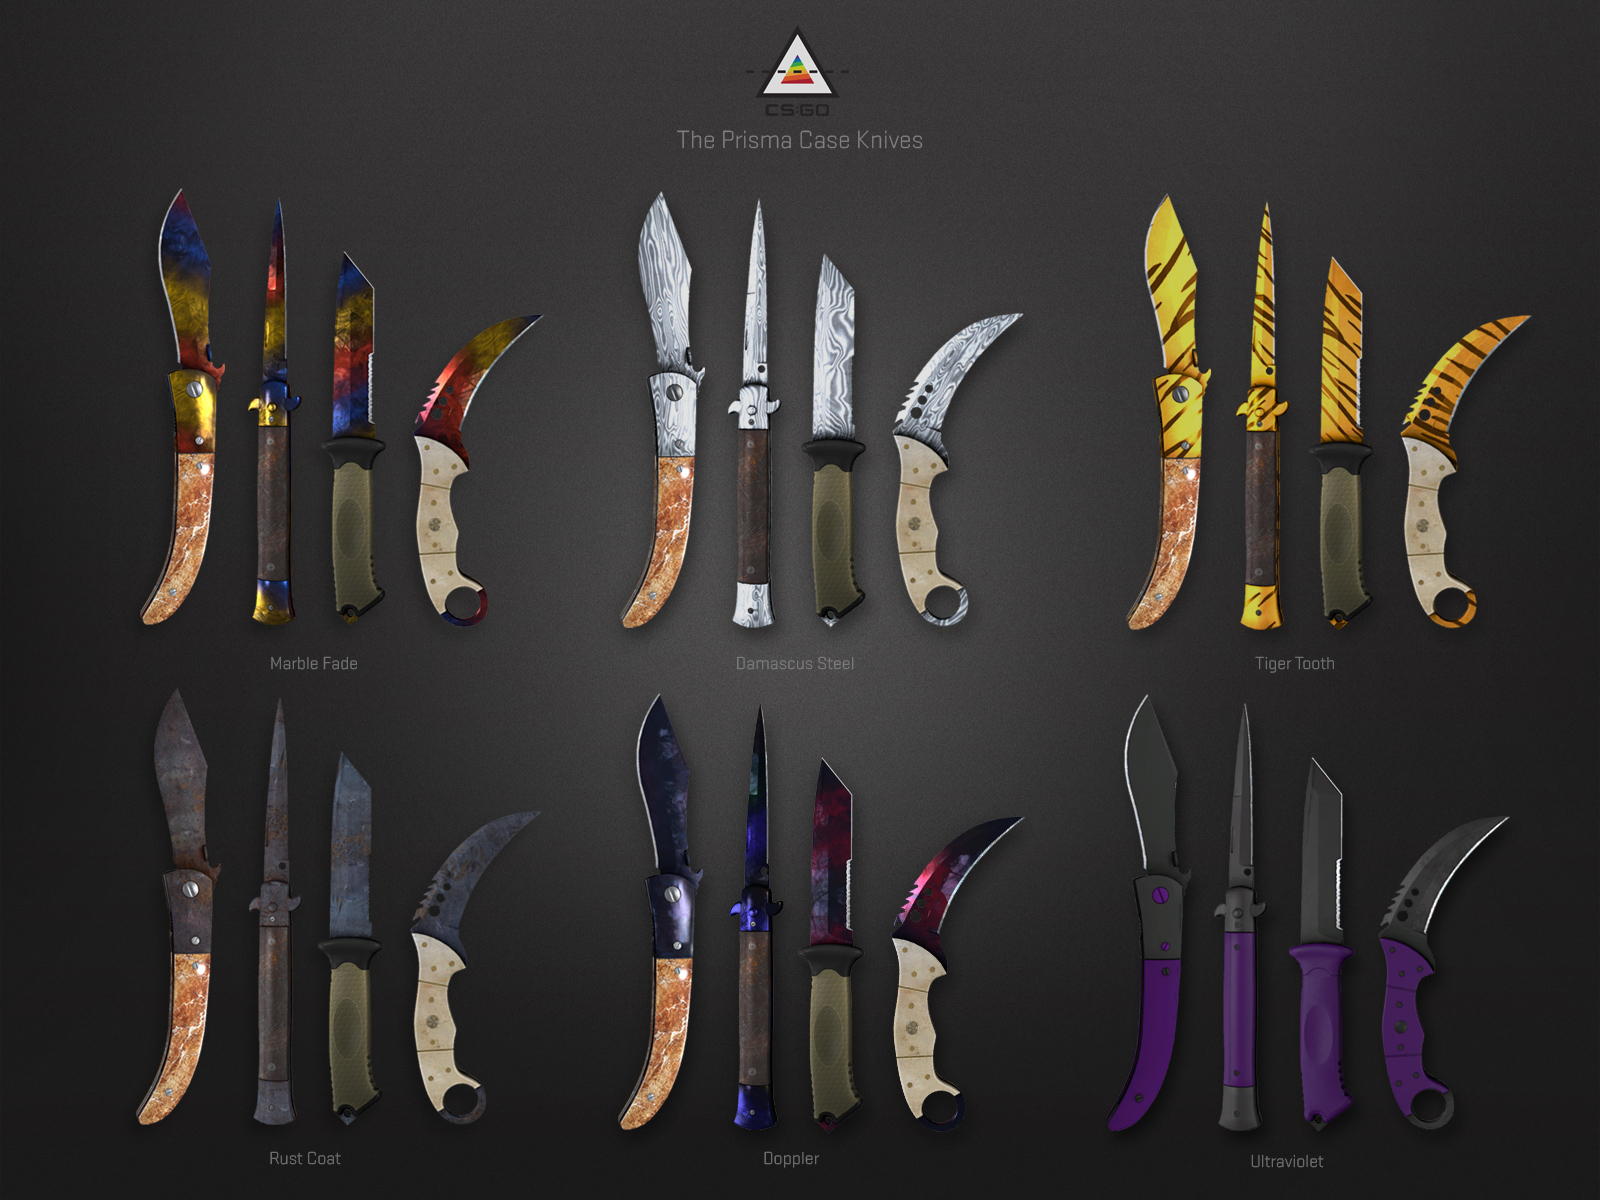 Prisma Case knife display for CS:GO